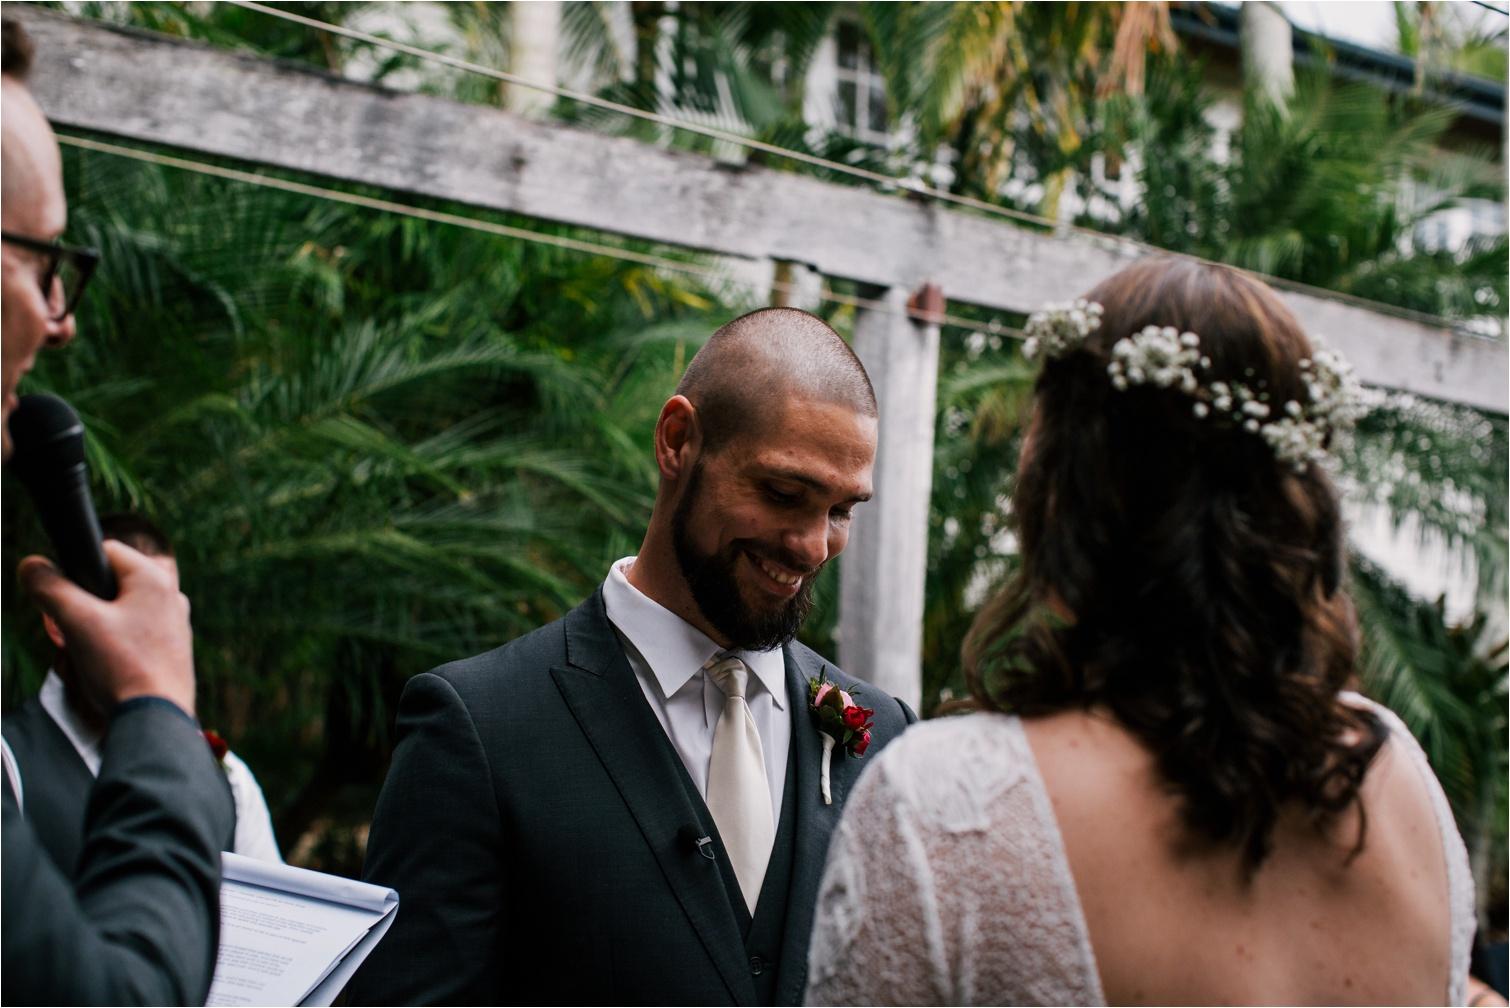 Hillstone_Brisbane_Wedding_Photography_0033.jpg